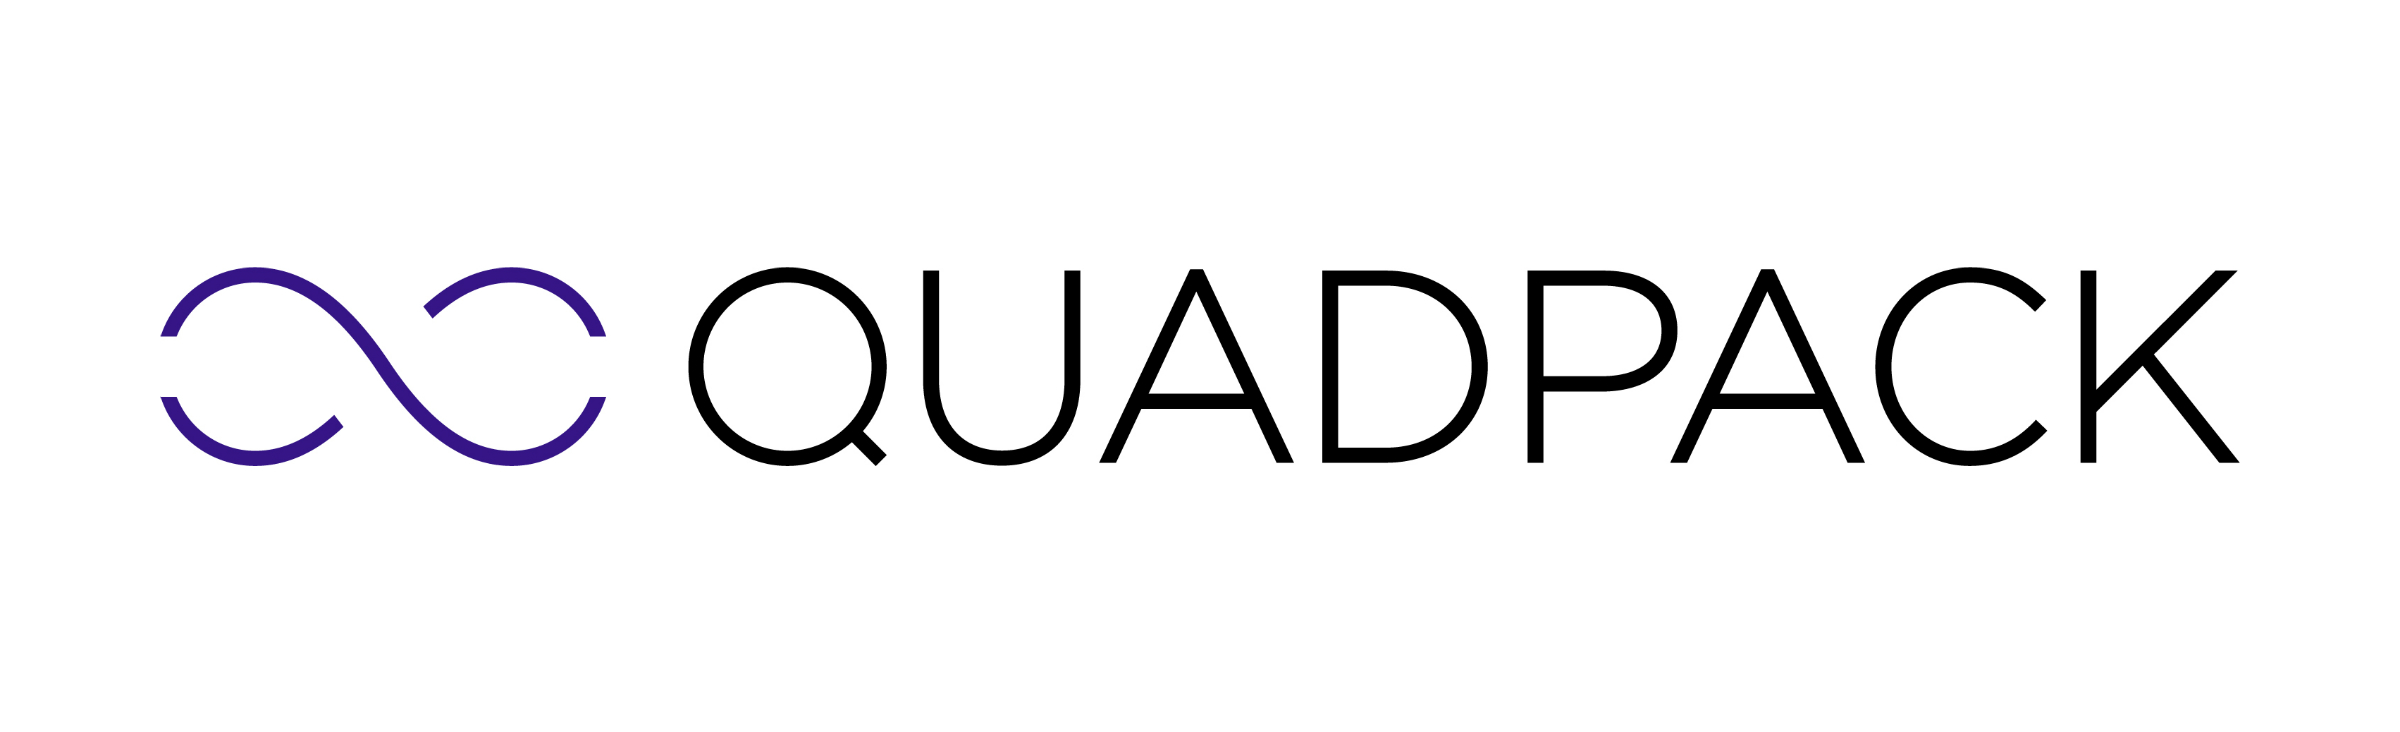 Quadpack Group